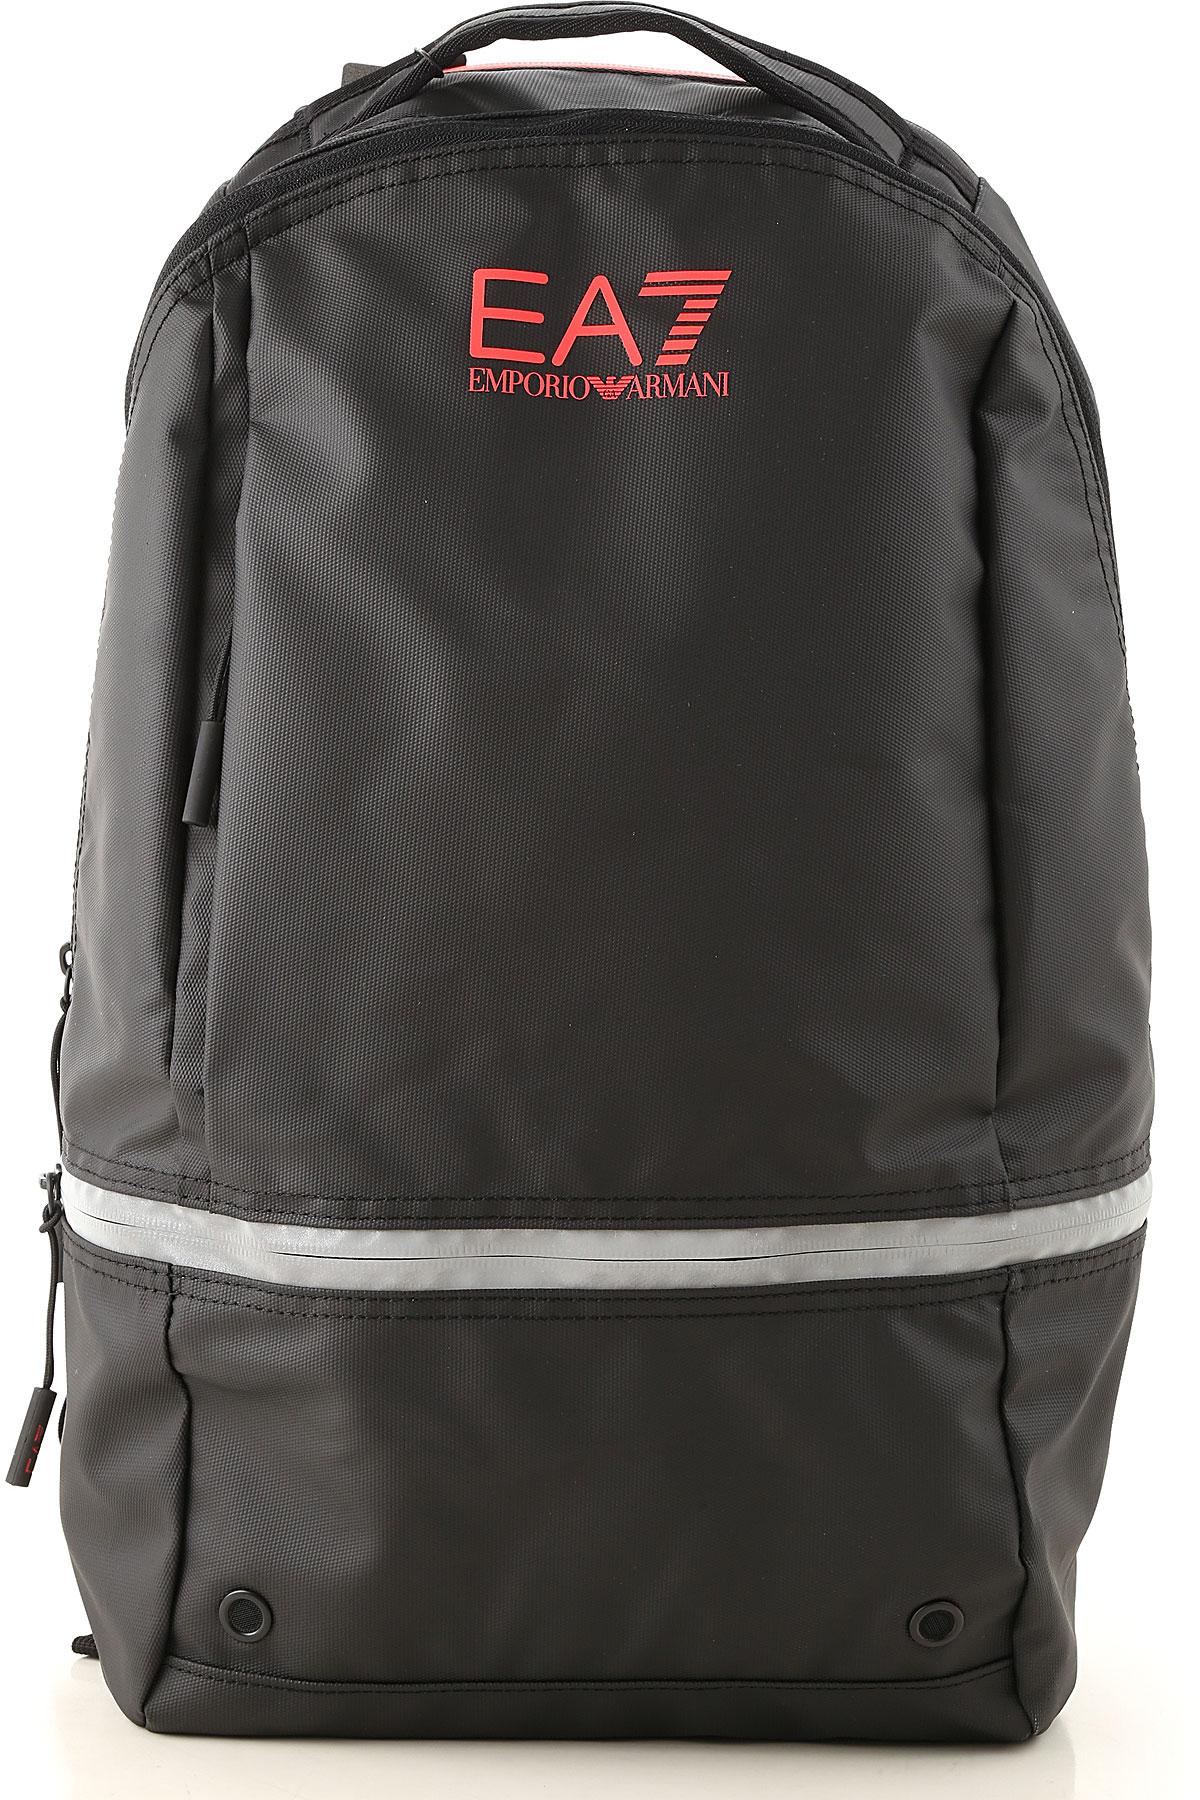 Emporio Armani Backpack for Men On Sale, Black, polyester, 2019